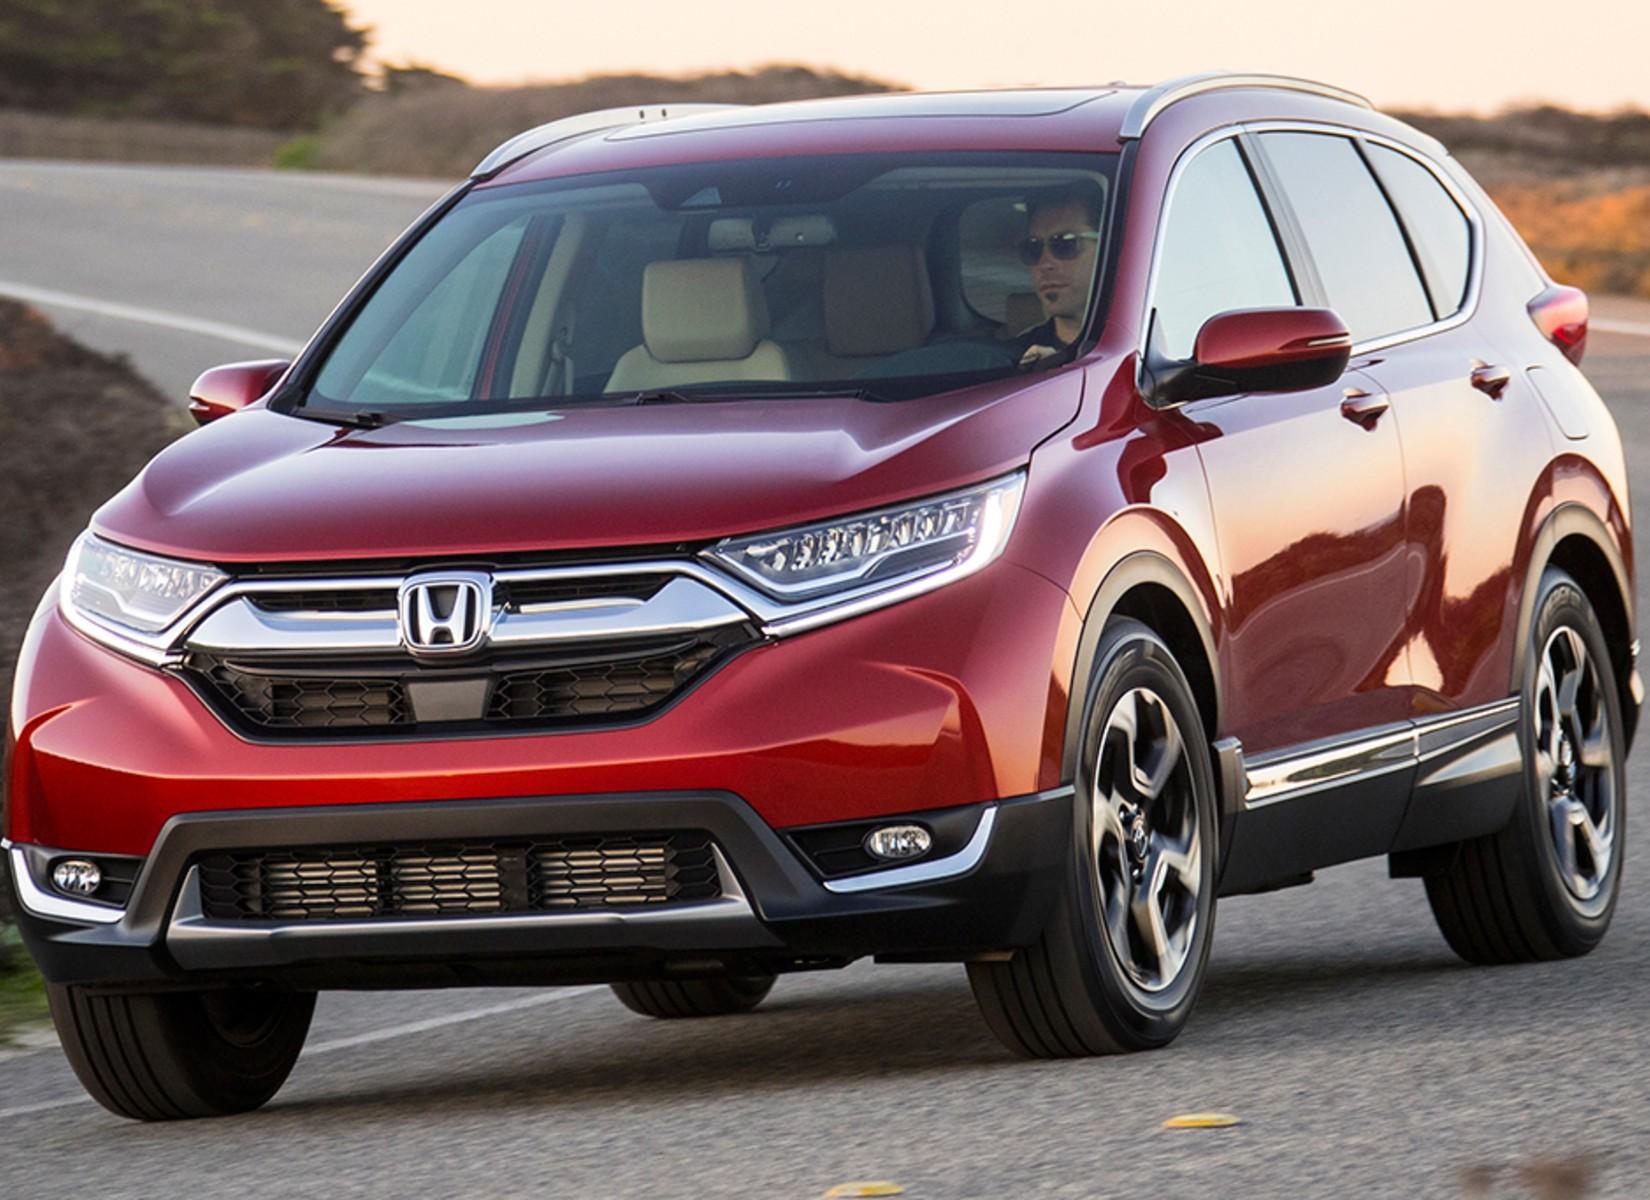 2019 Honda CR-V Front Exterior